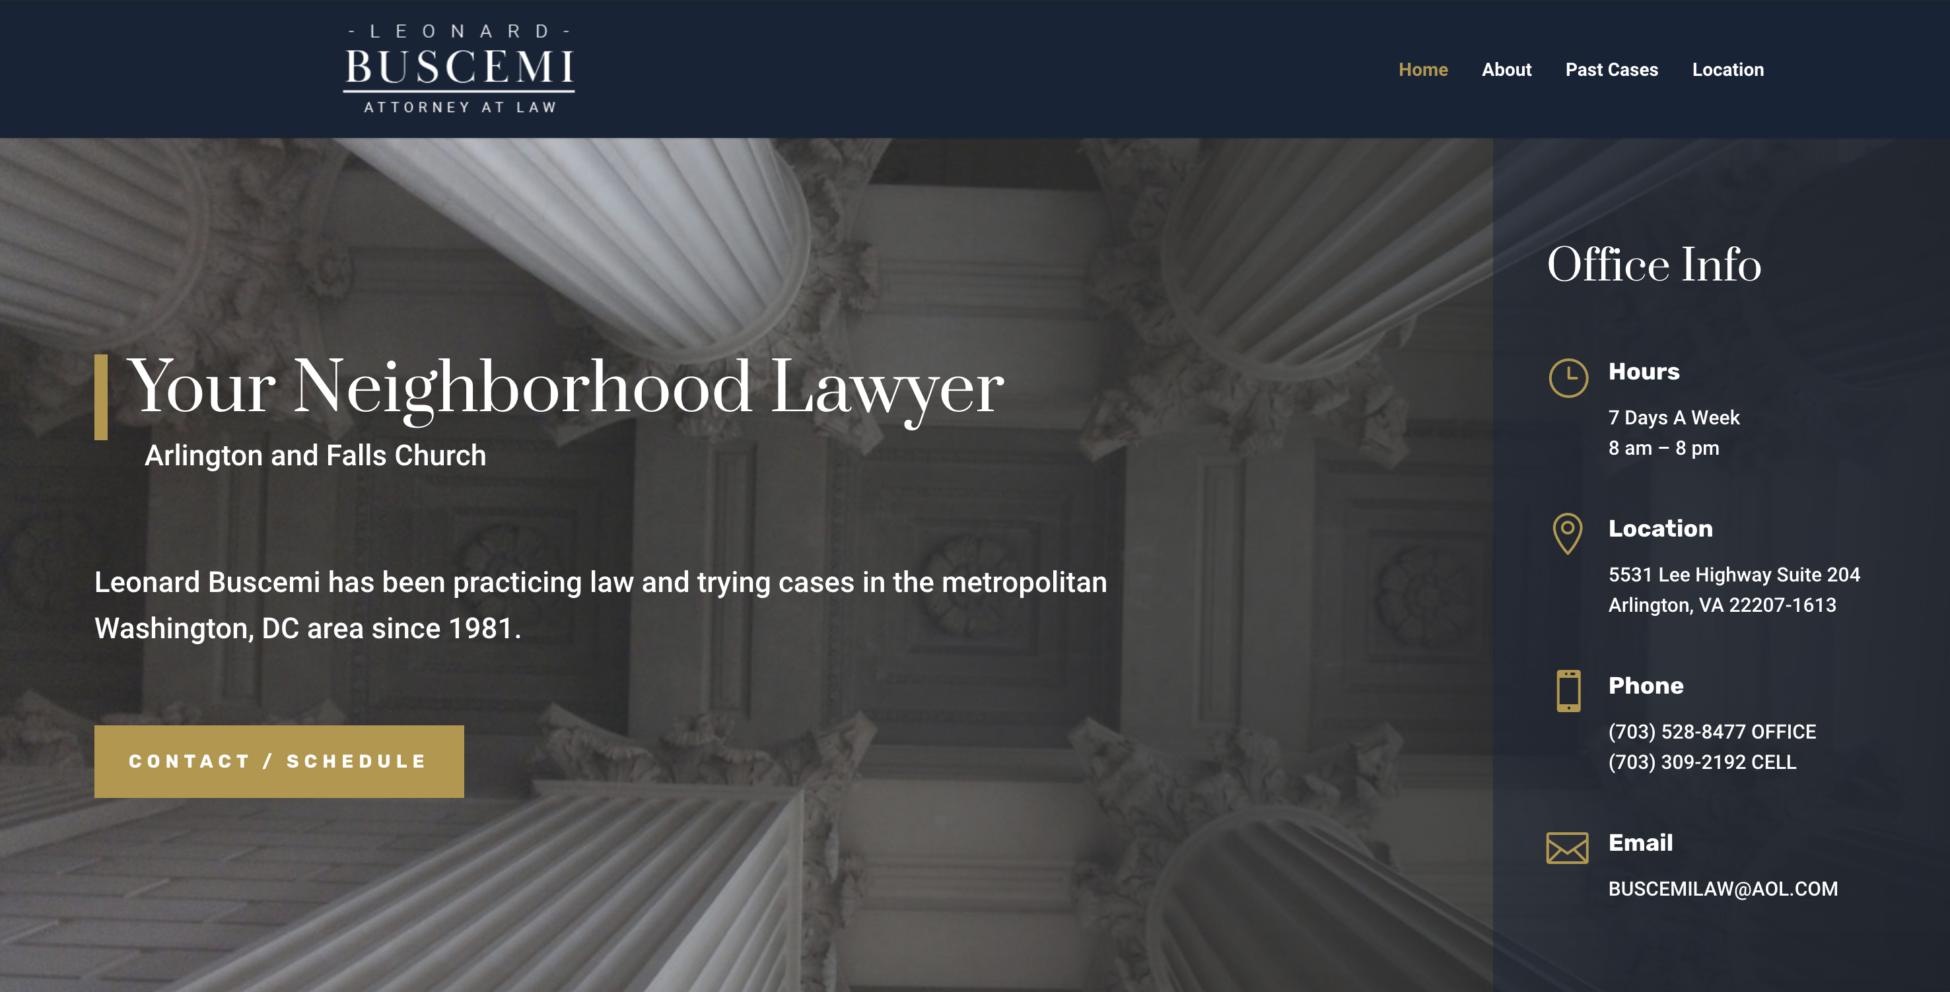 DC Law Firm Website Design using DIVI theme